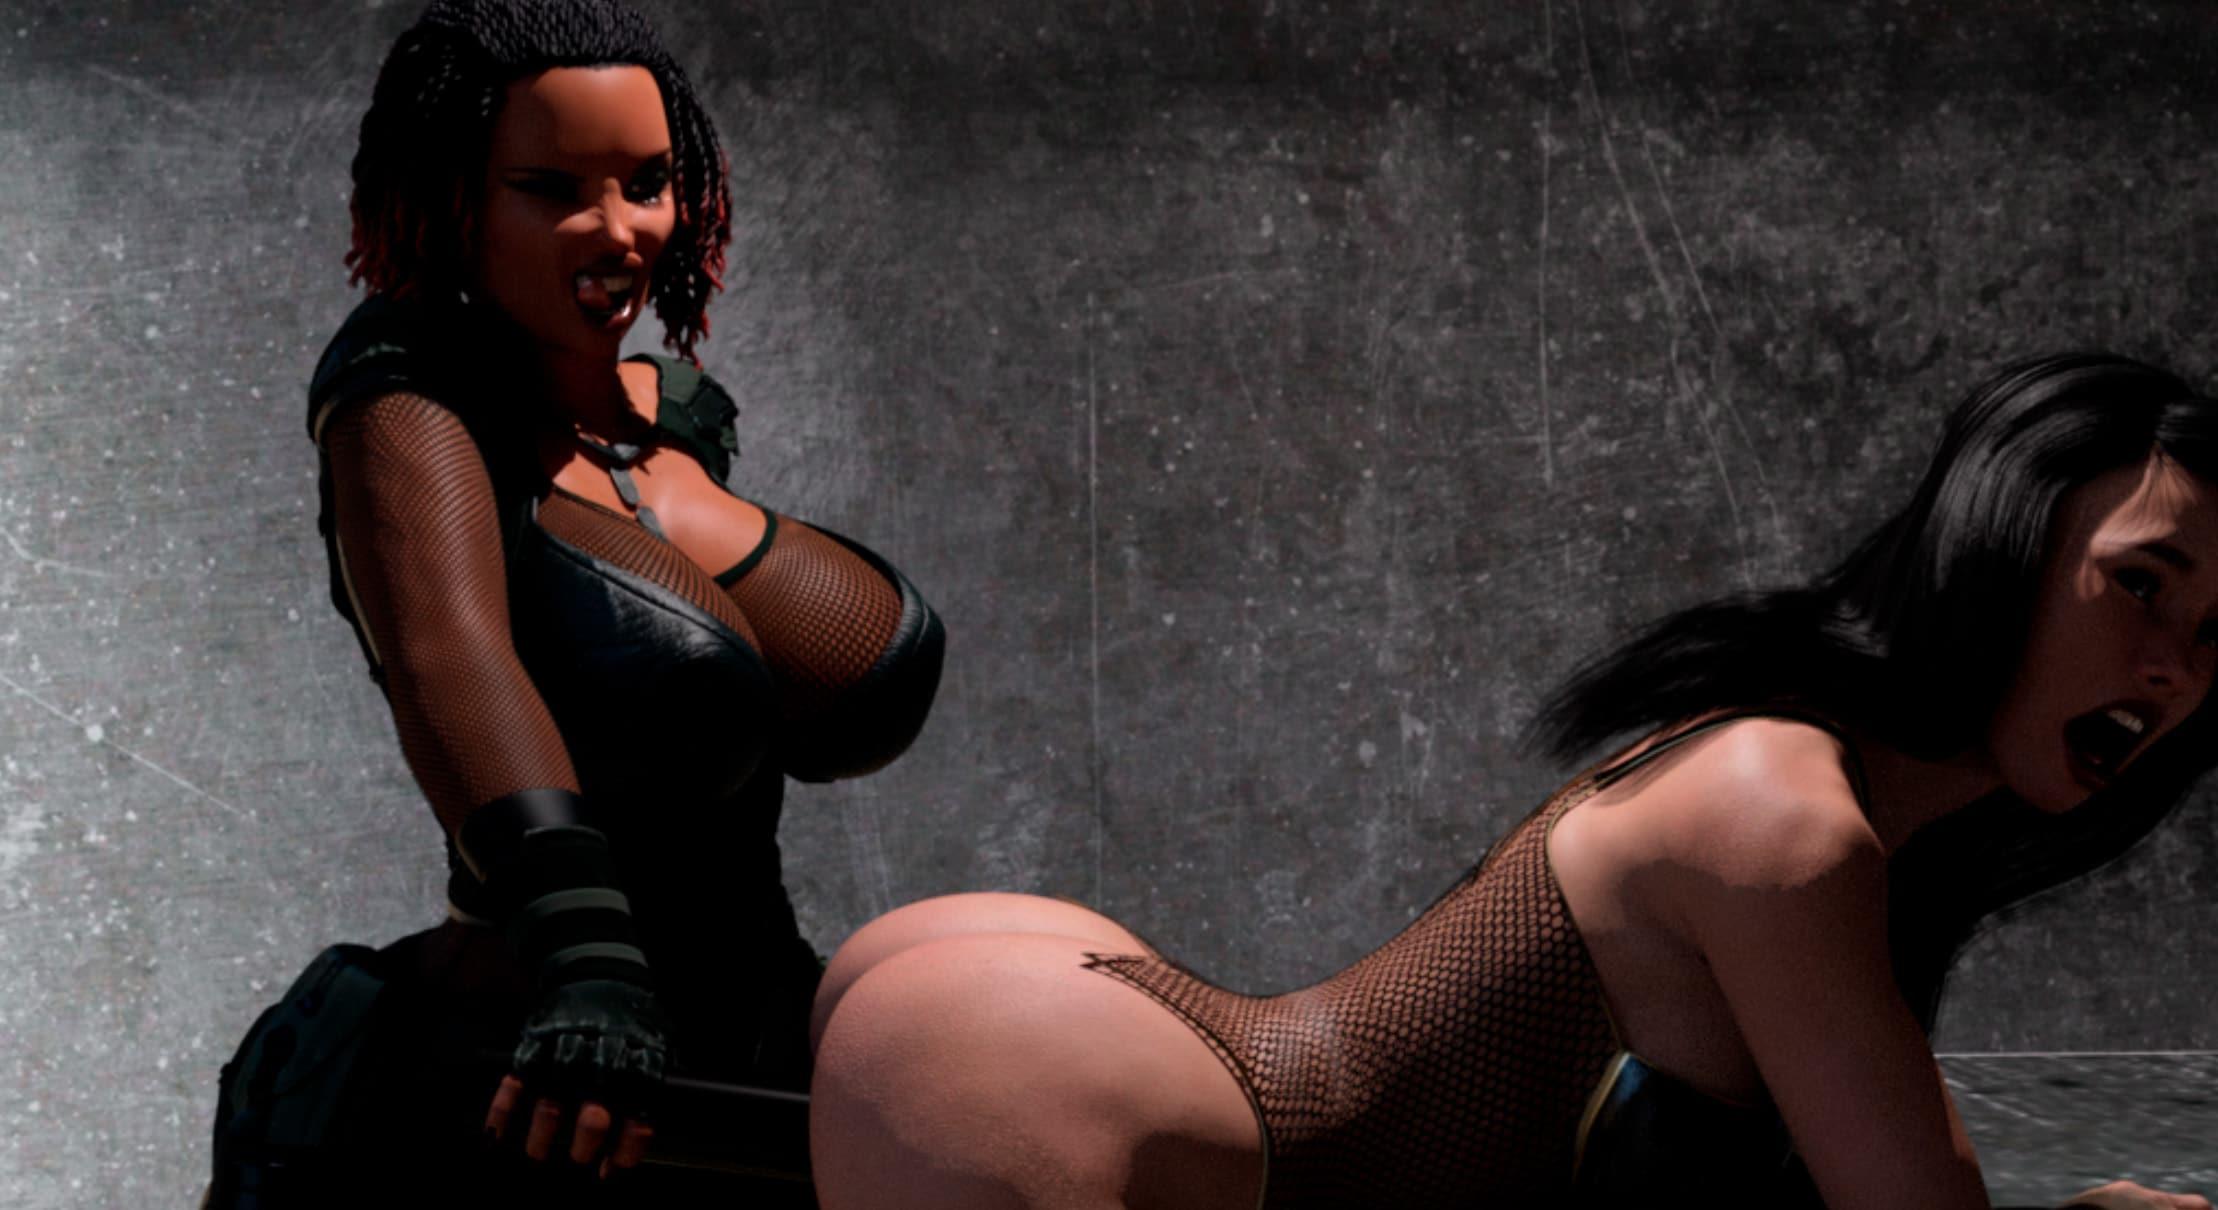 GamCore BDSM Action